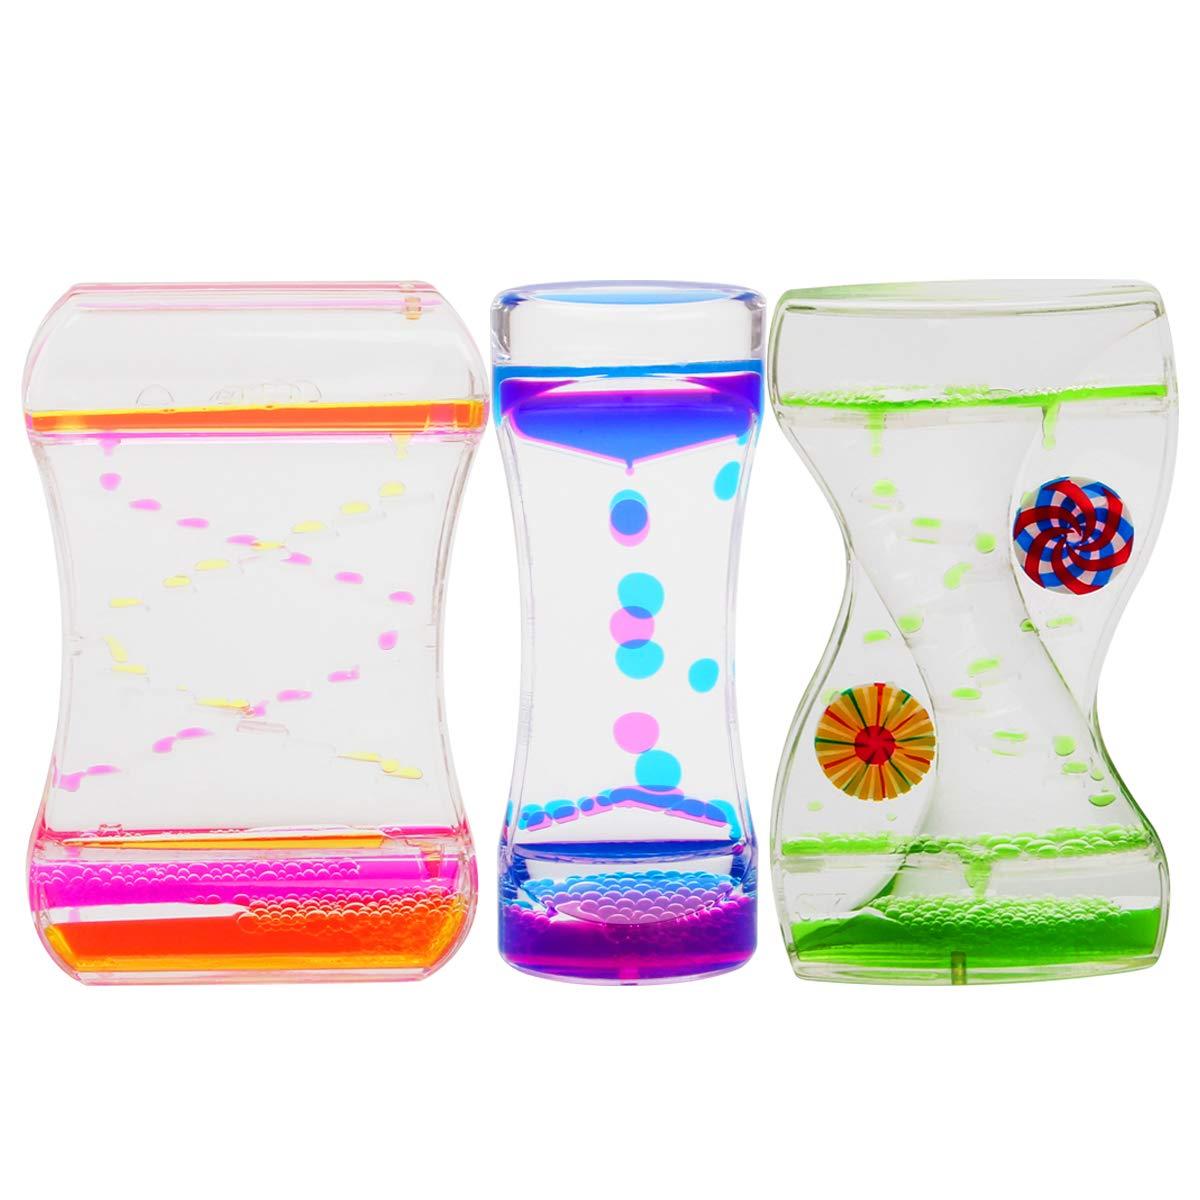 Coitak Liquid Motion Bubbler Timer for Sensory Play, Fidget Toy, Children Activity, Desk Top, 3 Pack, Assorted Colors